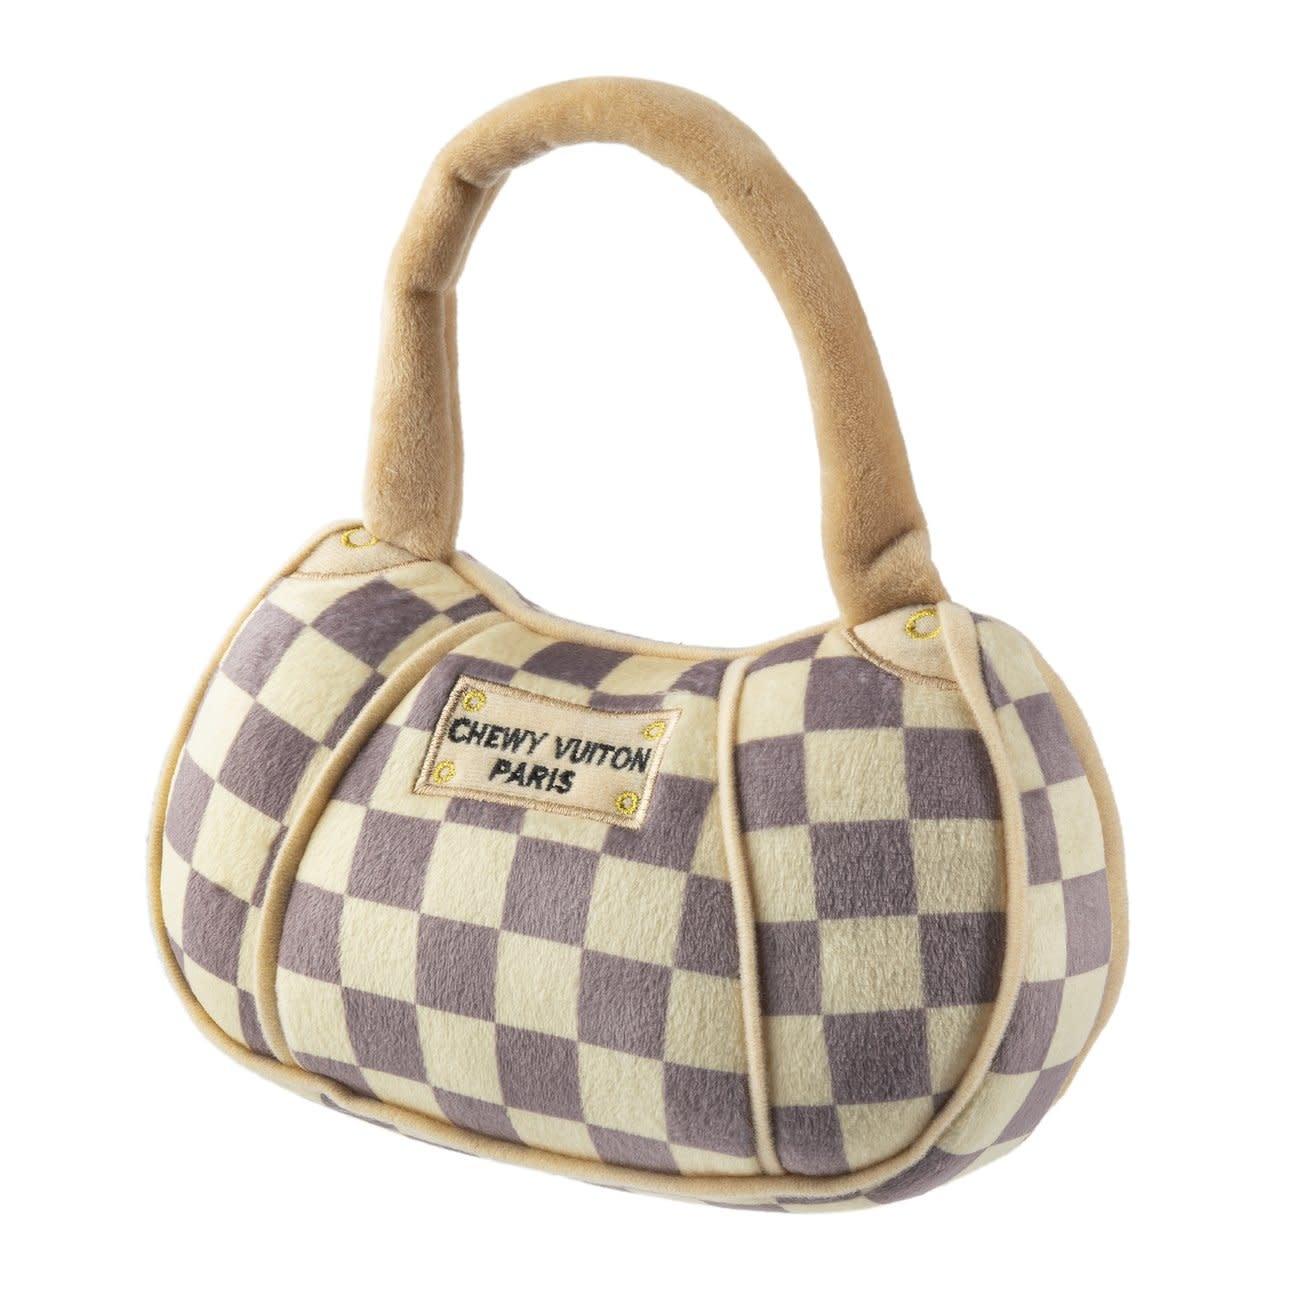 Checker Chewy Vuiton Purse XL